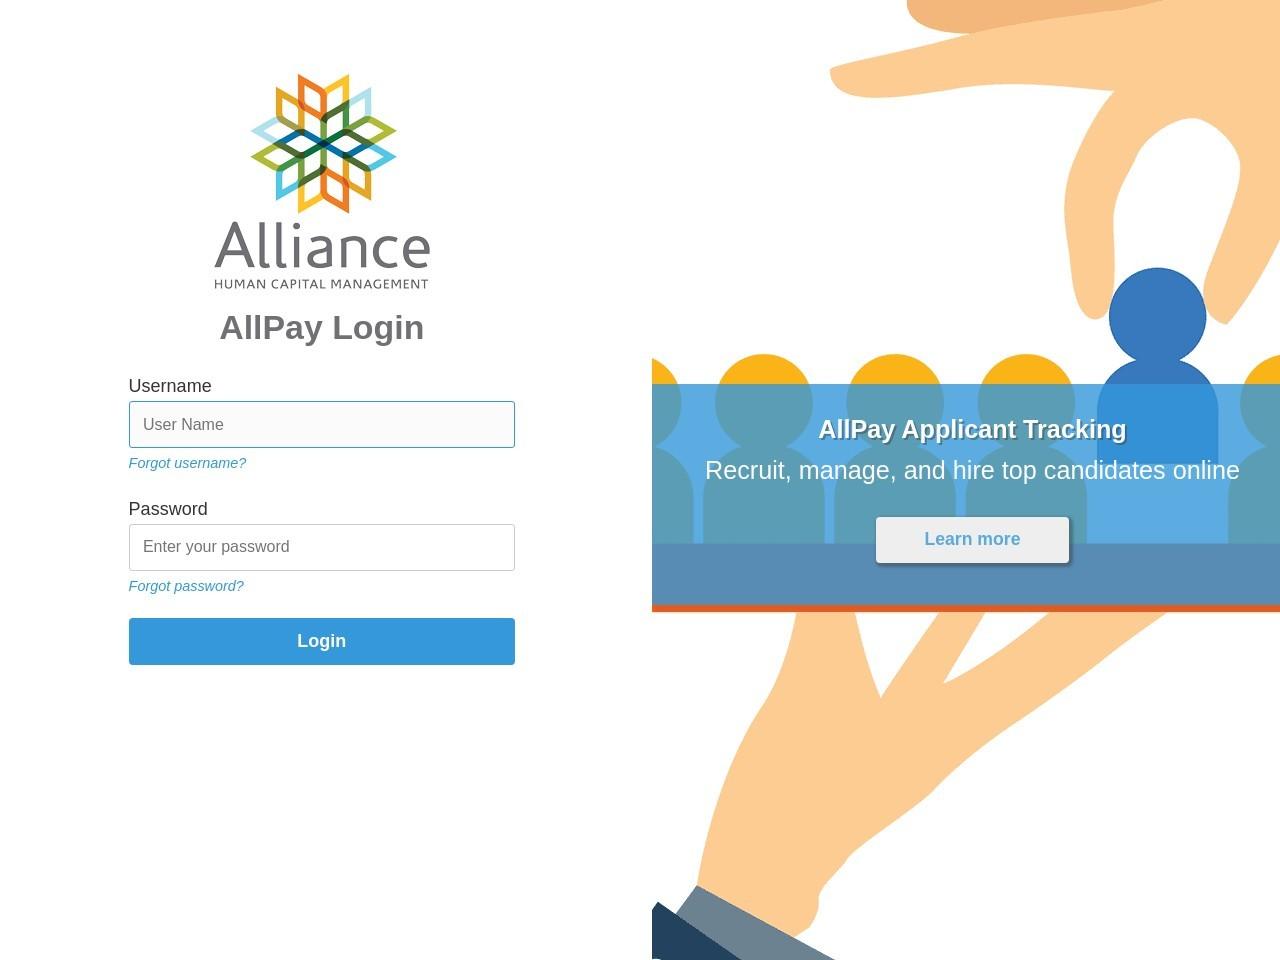 hralliance.net